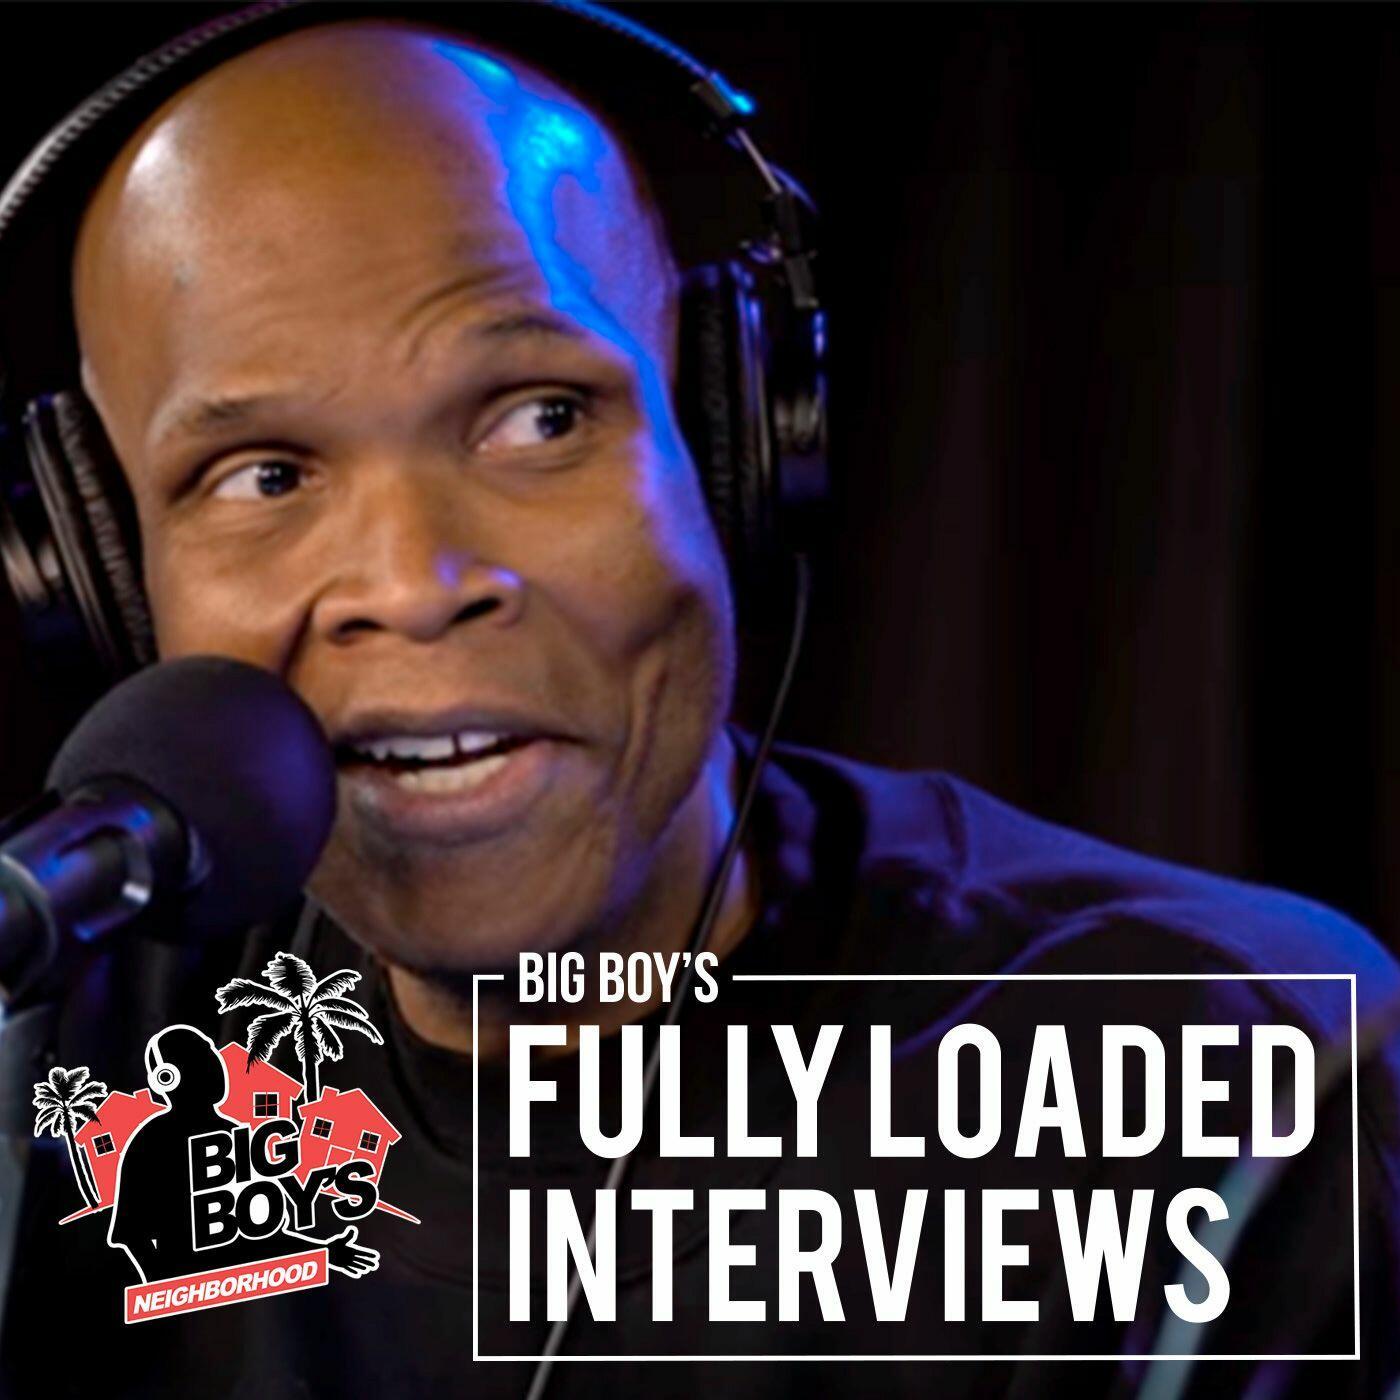 Big Boy's Fully Loaded Interviews